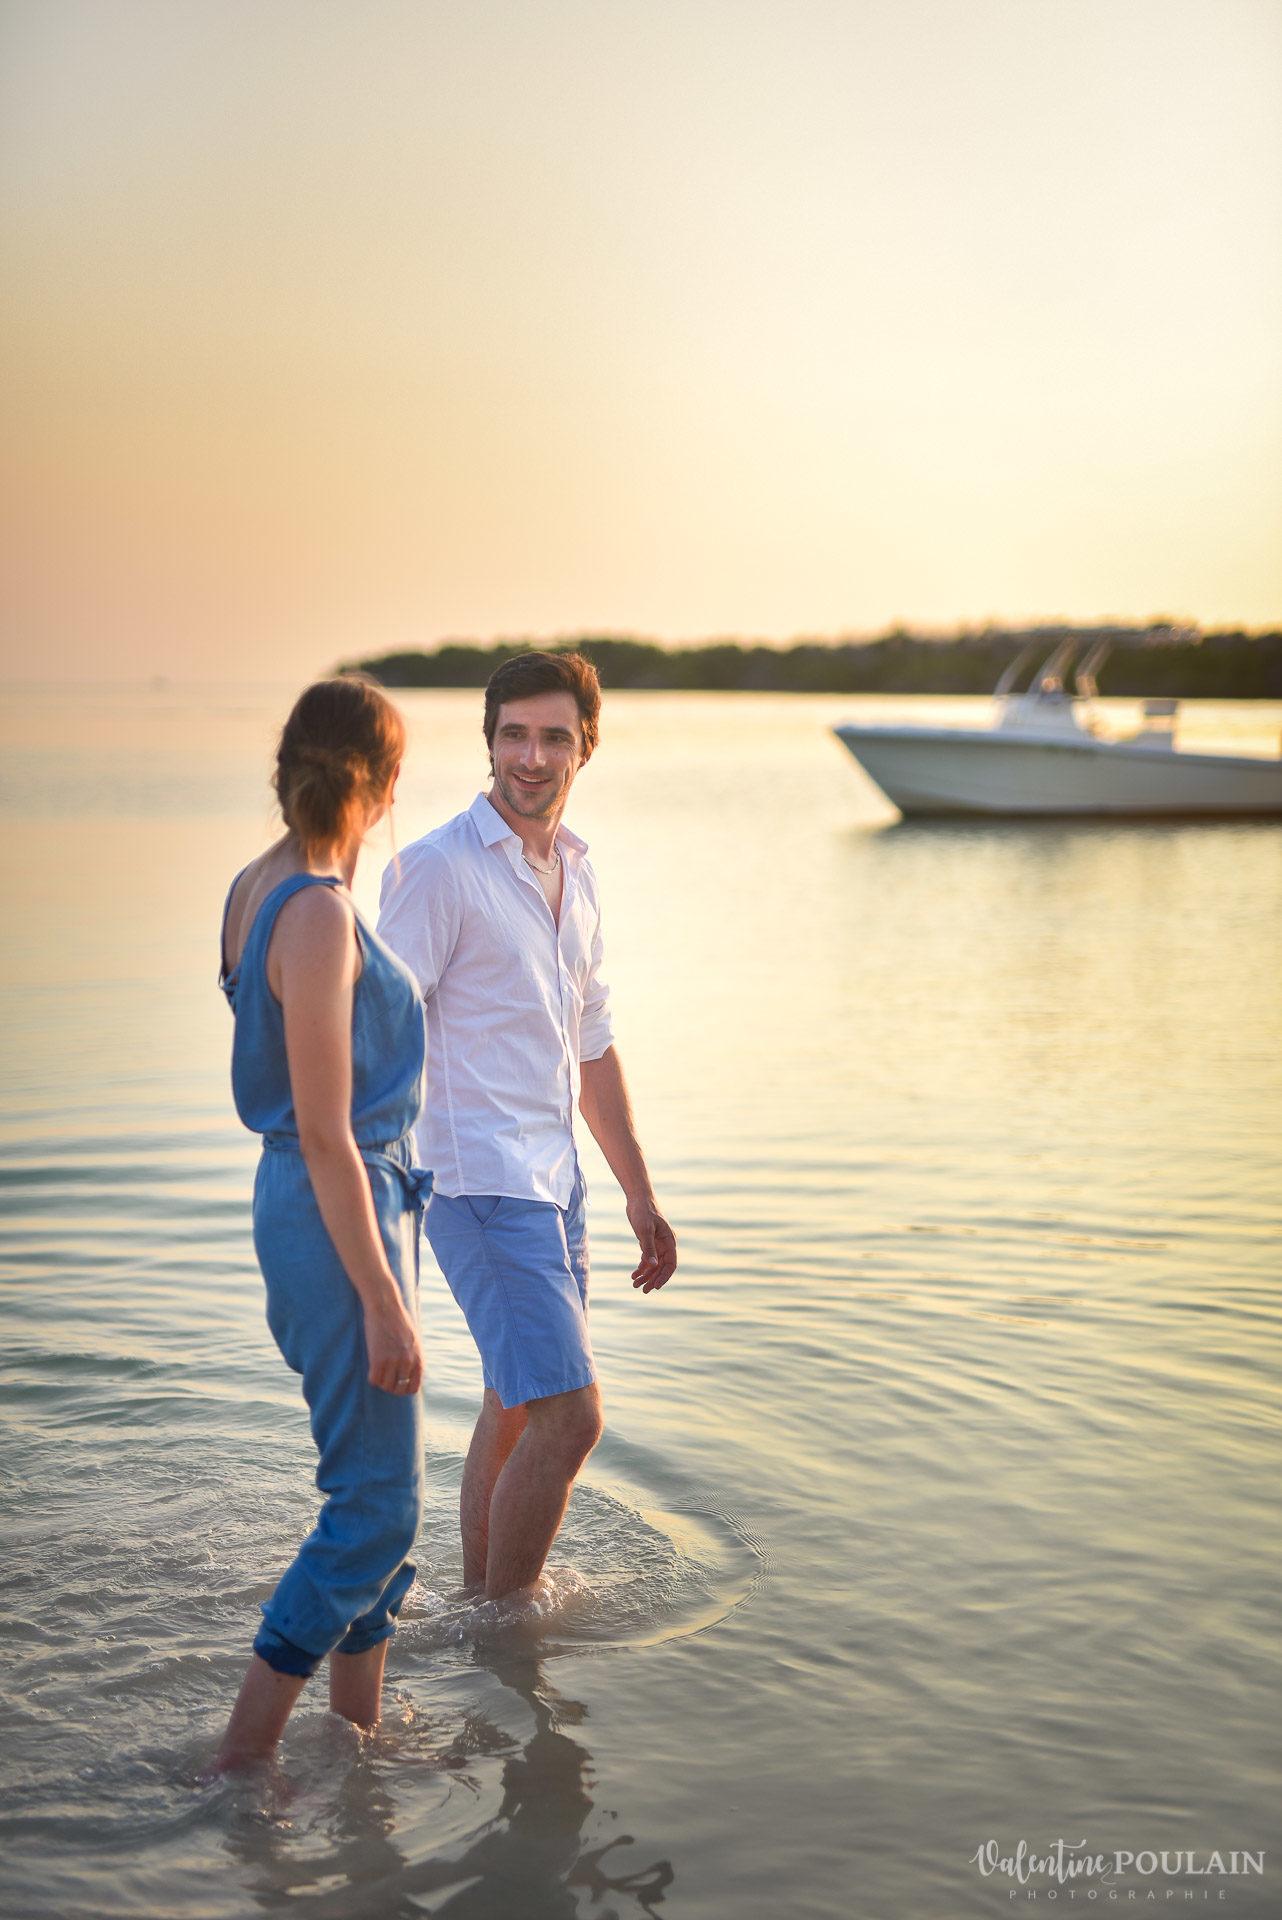 Couple Miami Wynwood - Valentine Poulain eau